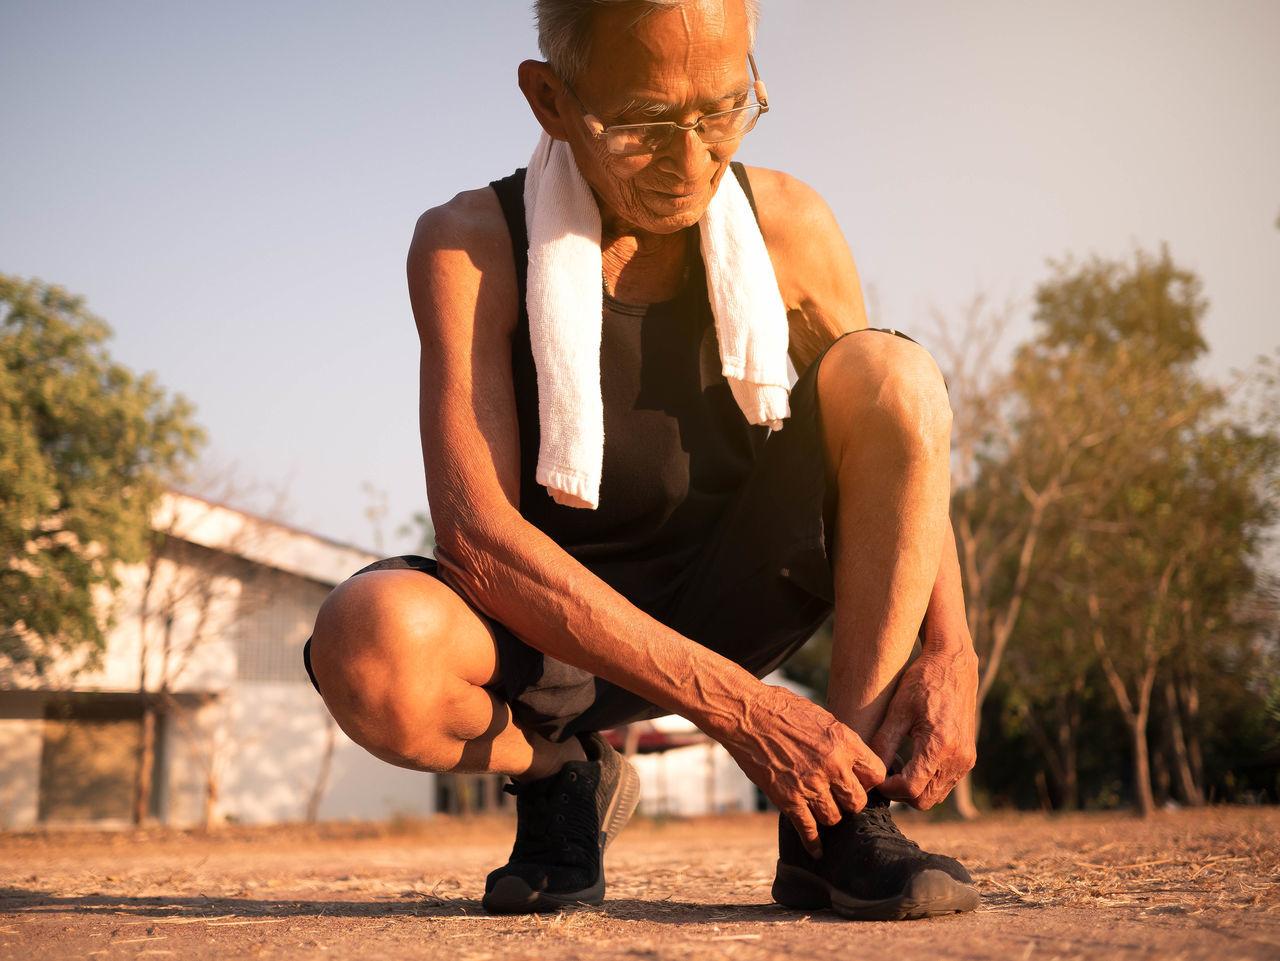 Man tying shoelace while crouching on land against sky